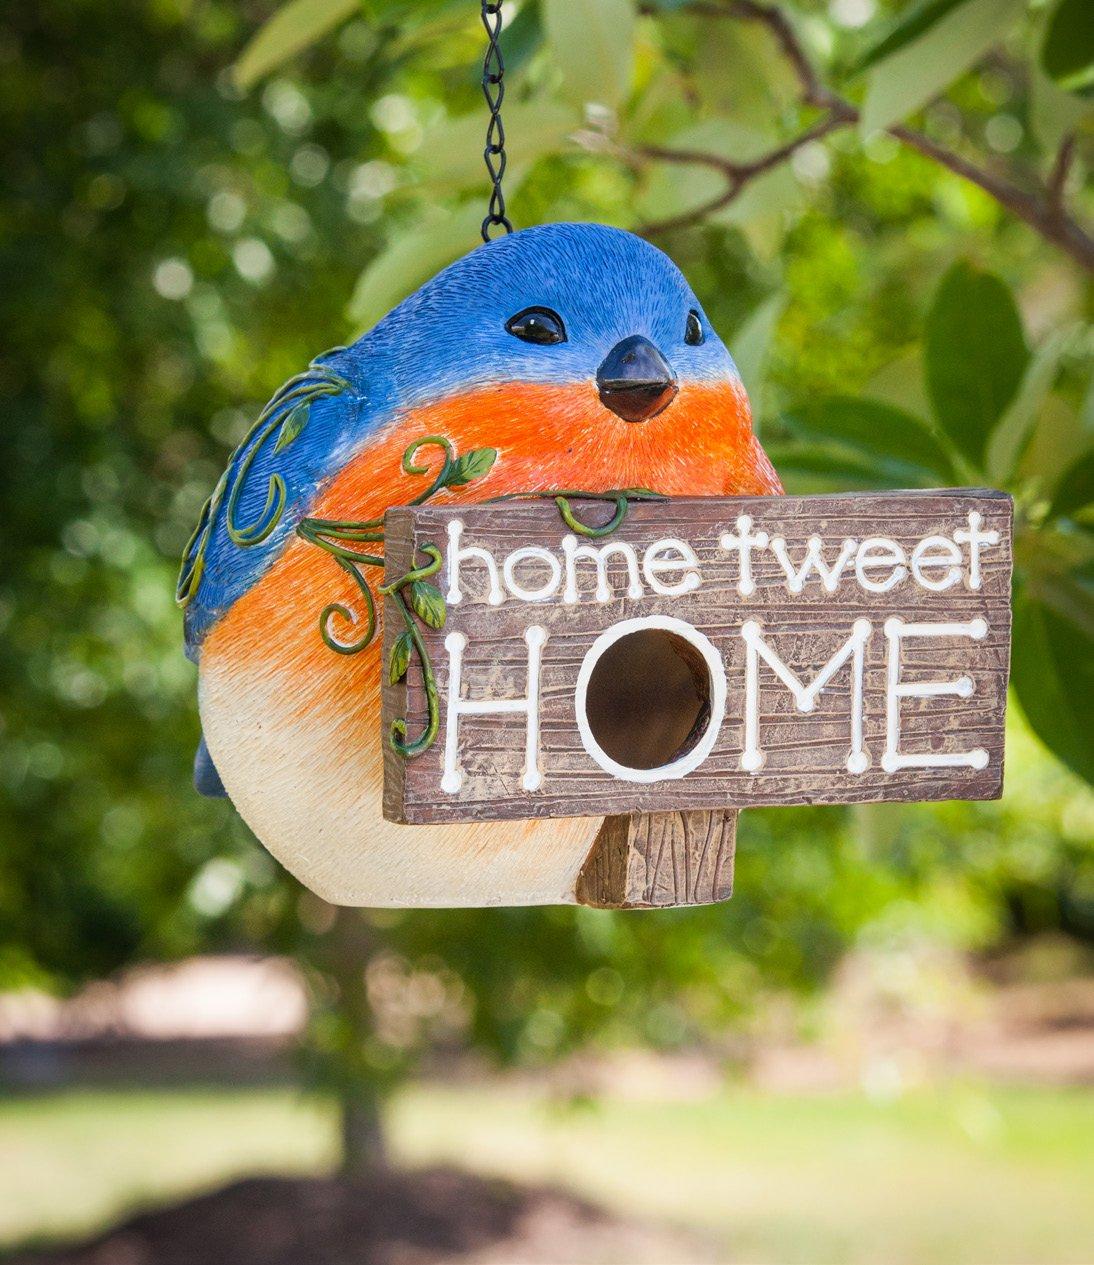 Polystone and Plastic Portly Birdhouse Blue Bird,Home Tweet Home